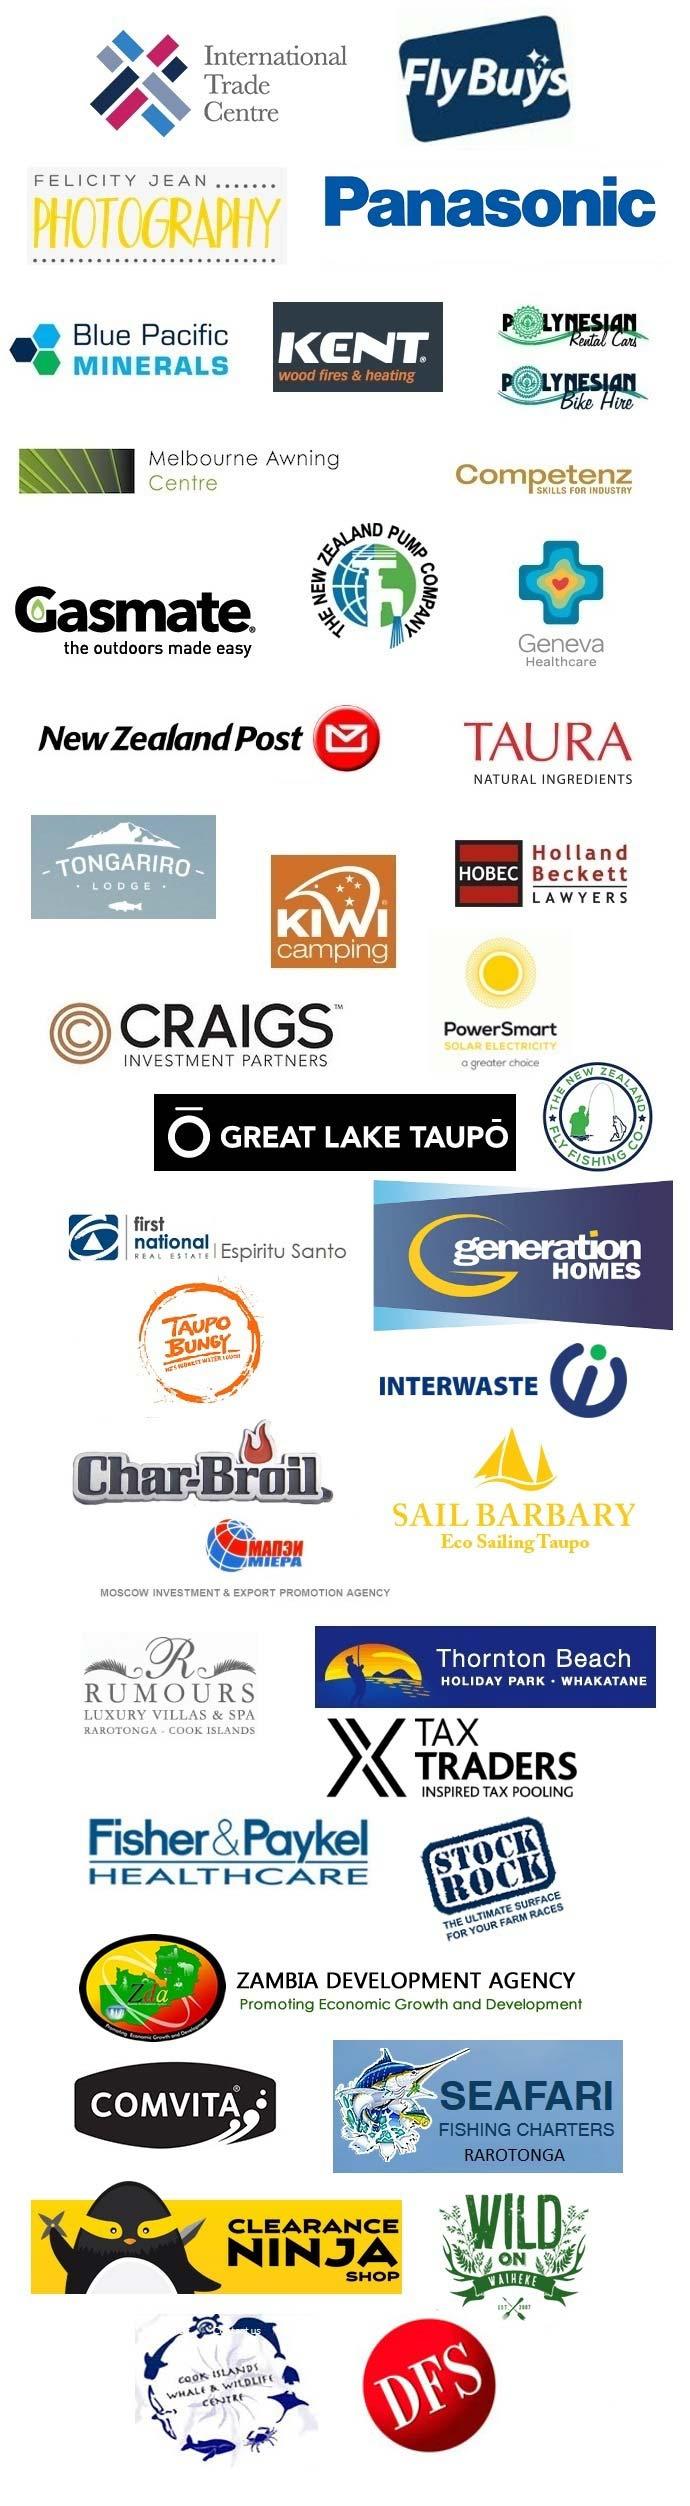 OA-Testimonial-Logos